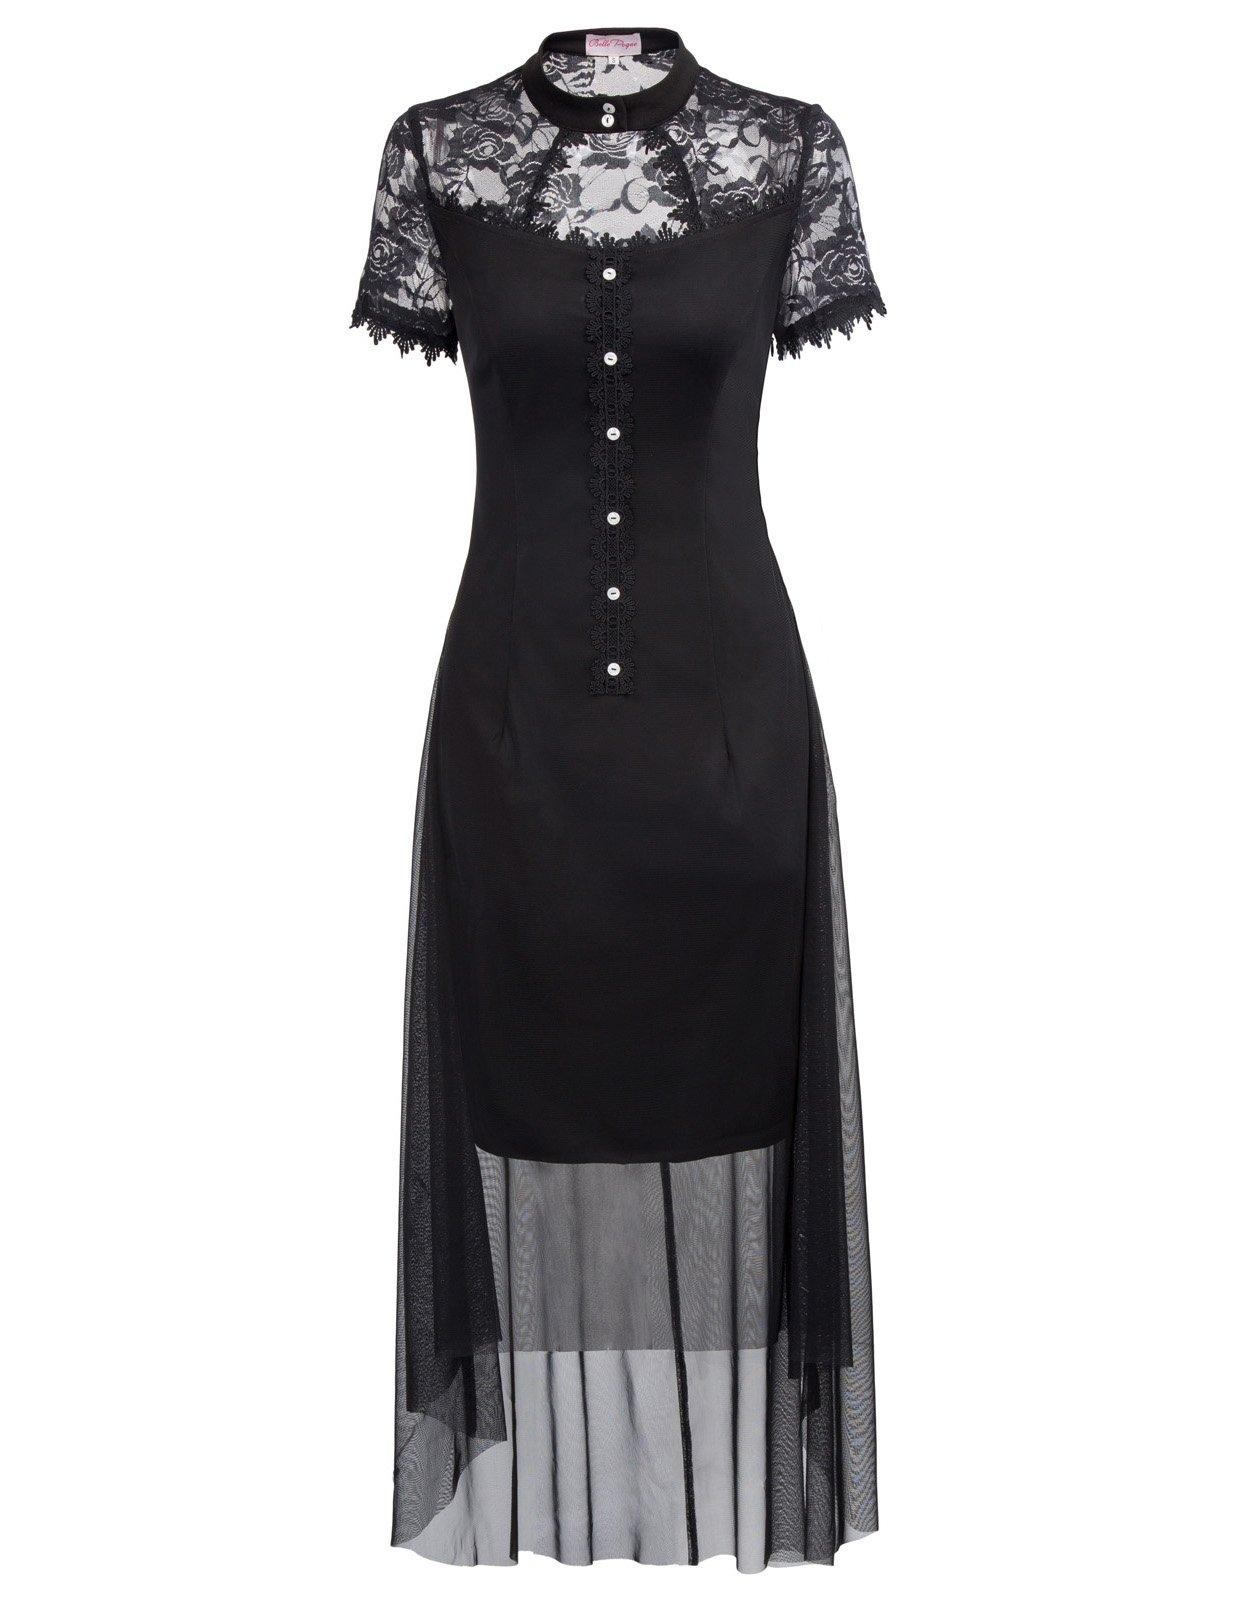 Belle Poque Women's Vintage Steampunk Gothic Victorian High Low Hem Lace Dress 3